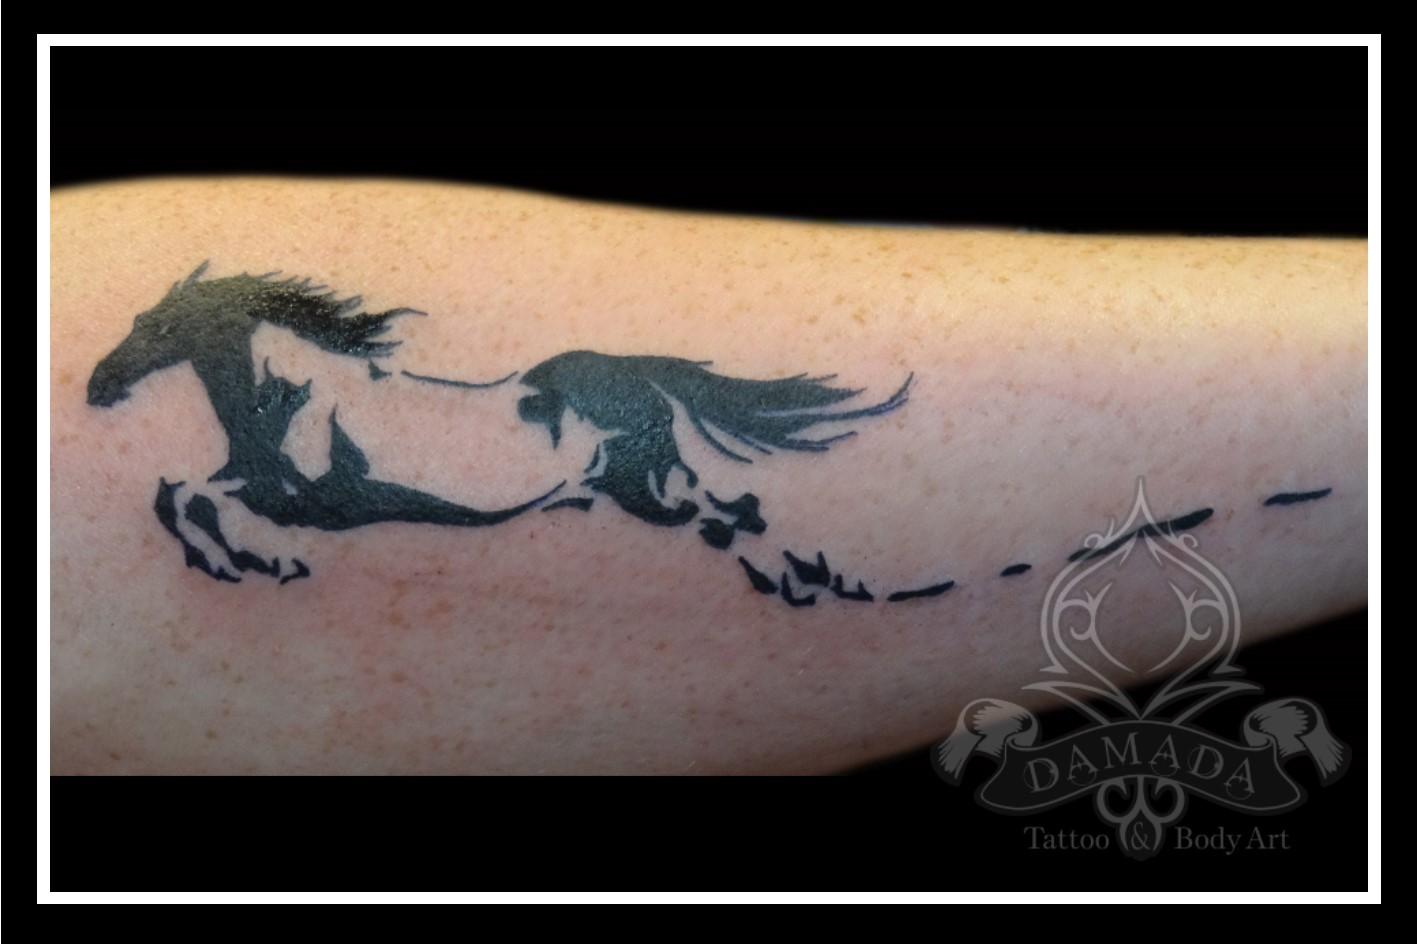 Portfolio Black Tattoos Damada Tattoo Body Art